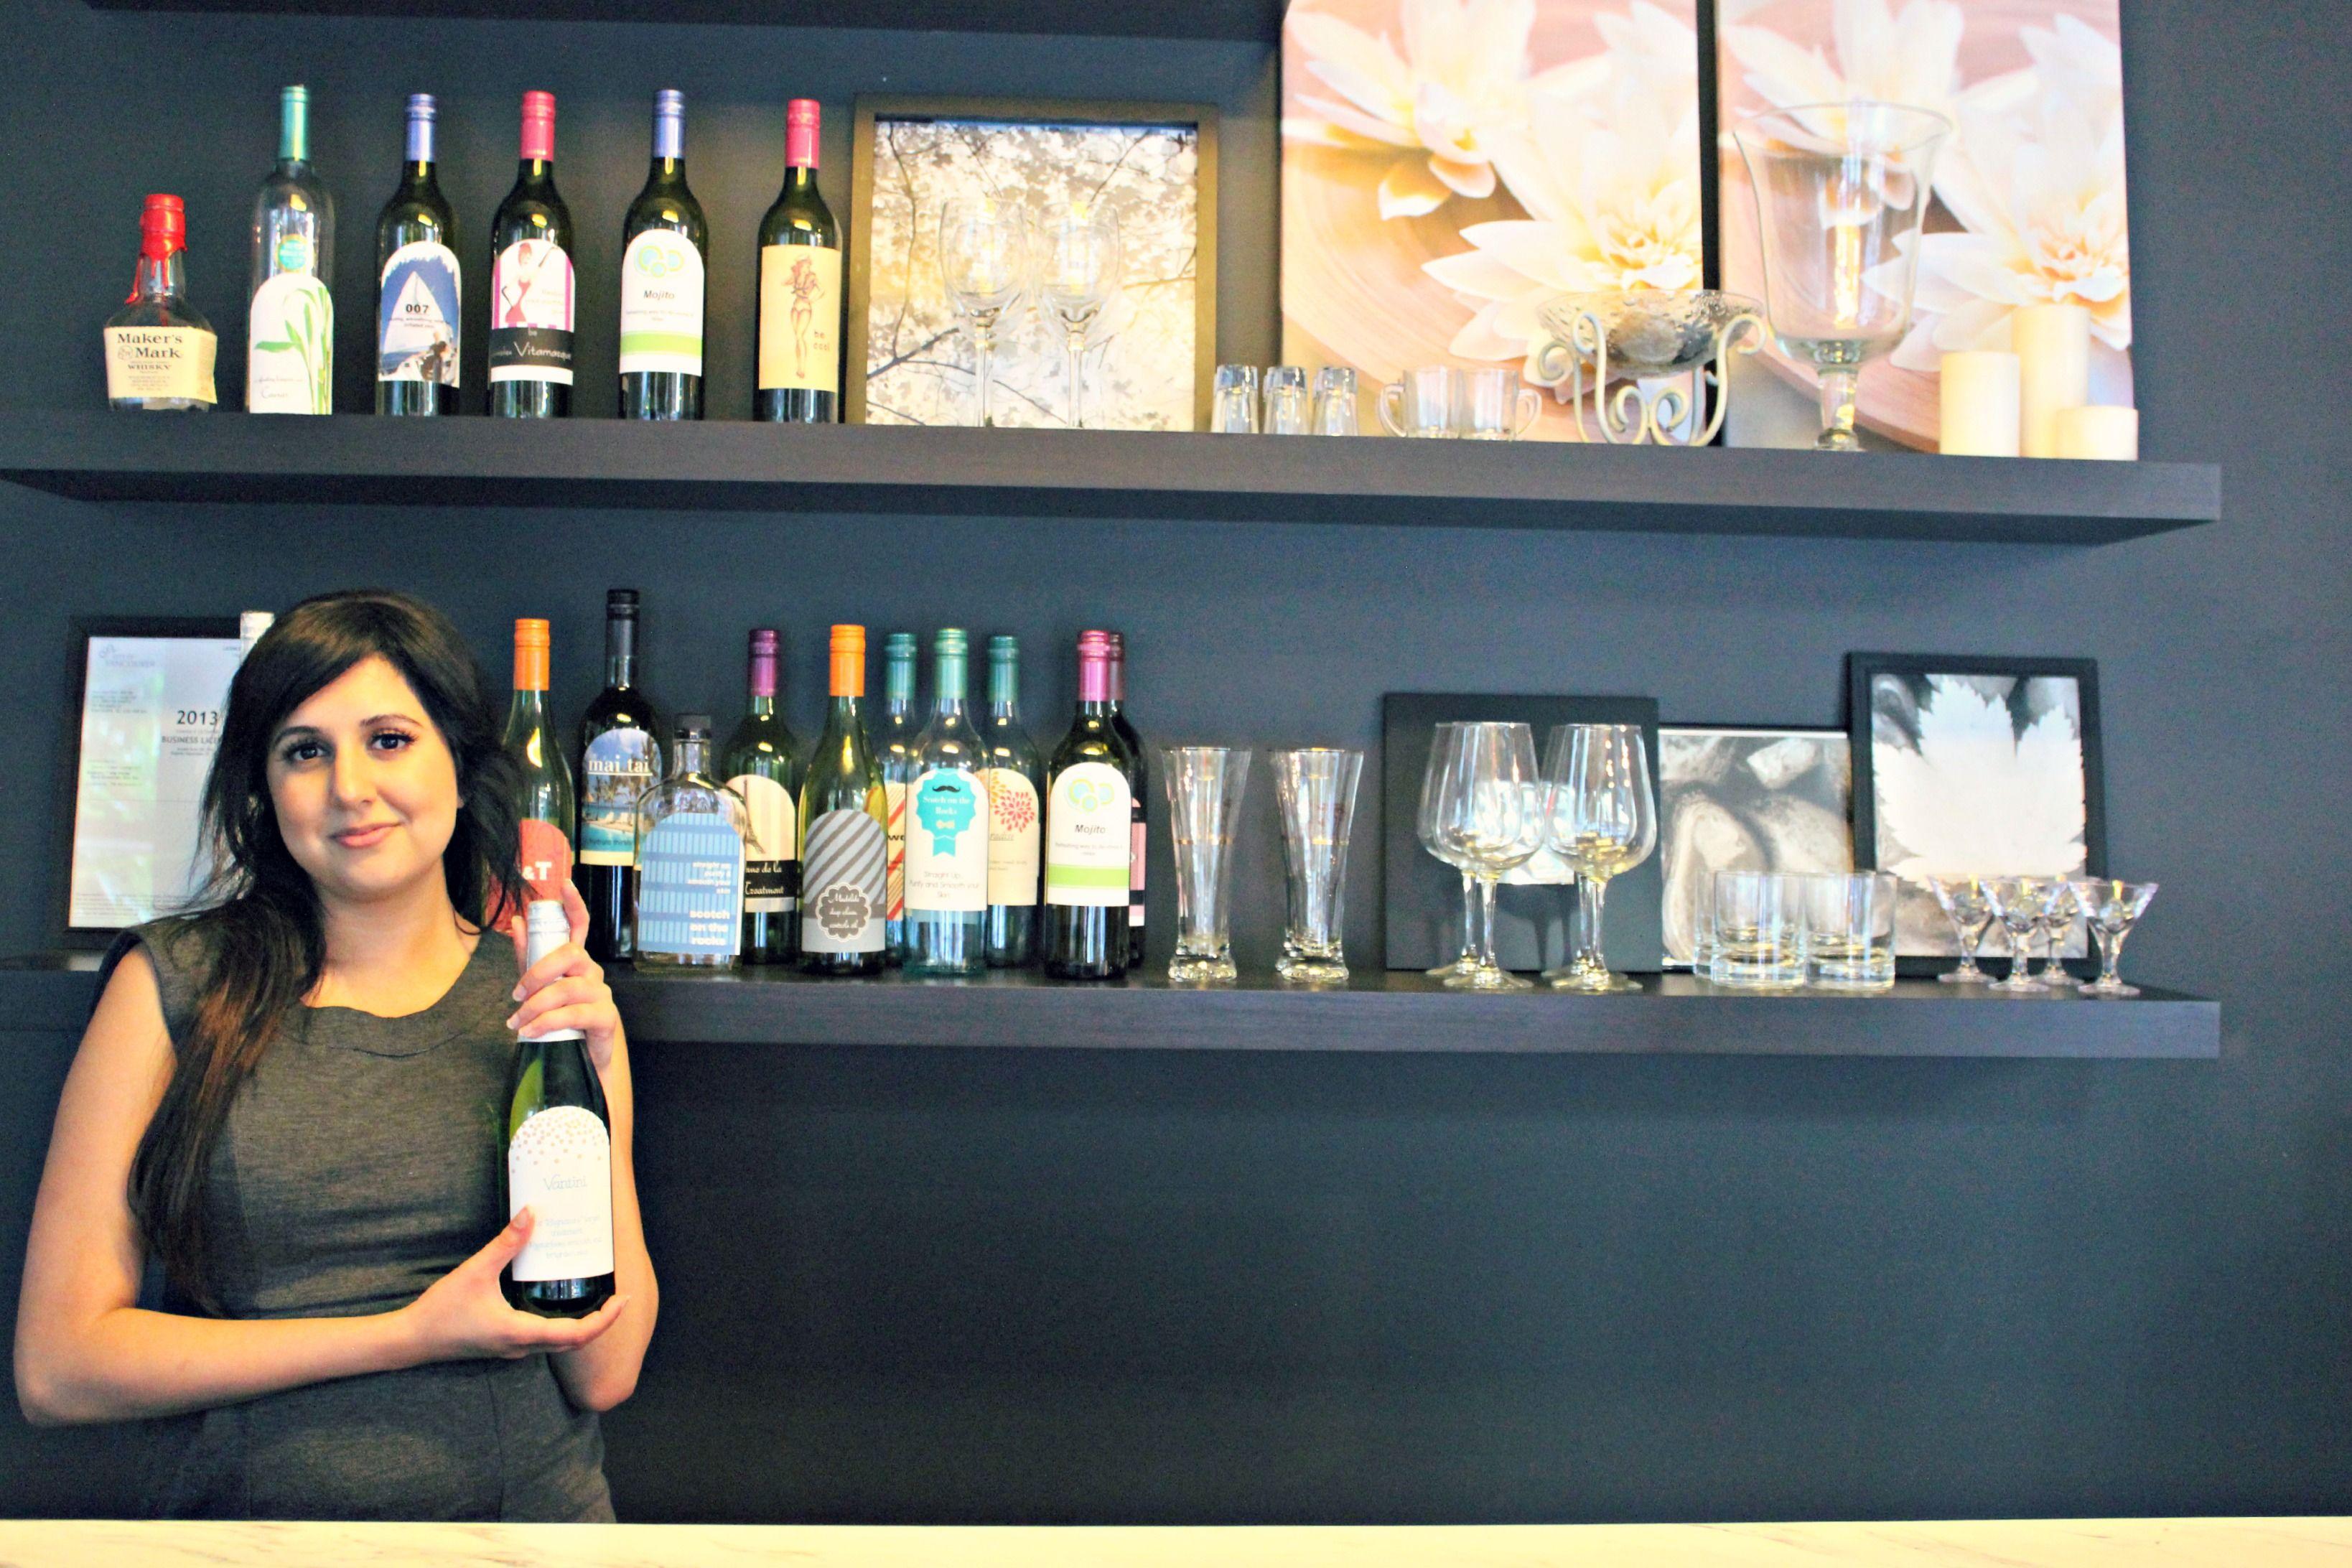 Vancouver's Skintender Amy Sahota has the expert edge on